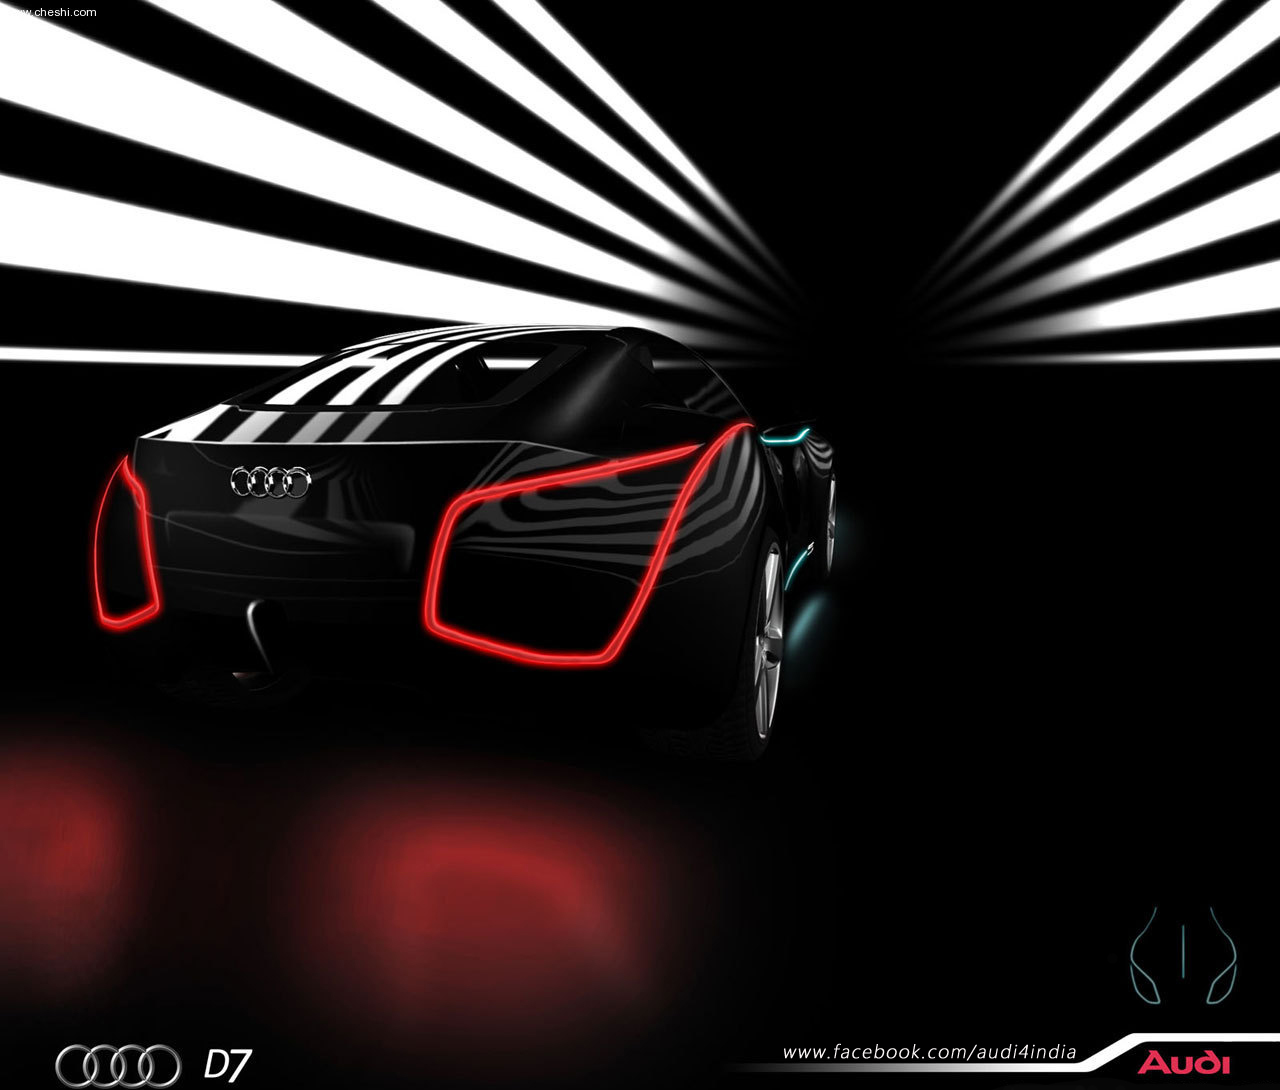 http://2.bp.blogspot.com/-S50Il2Kr6dc/TteSAGVVq7I/AAAAAAAAC9A/Ff9NfMaK_kE/s1600/Audi-D7-Concept-4%20copy.jpg